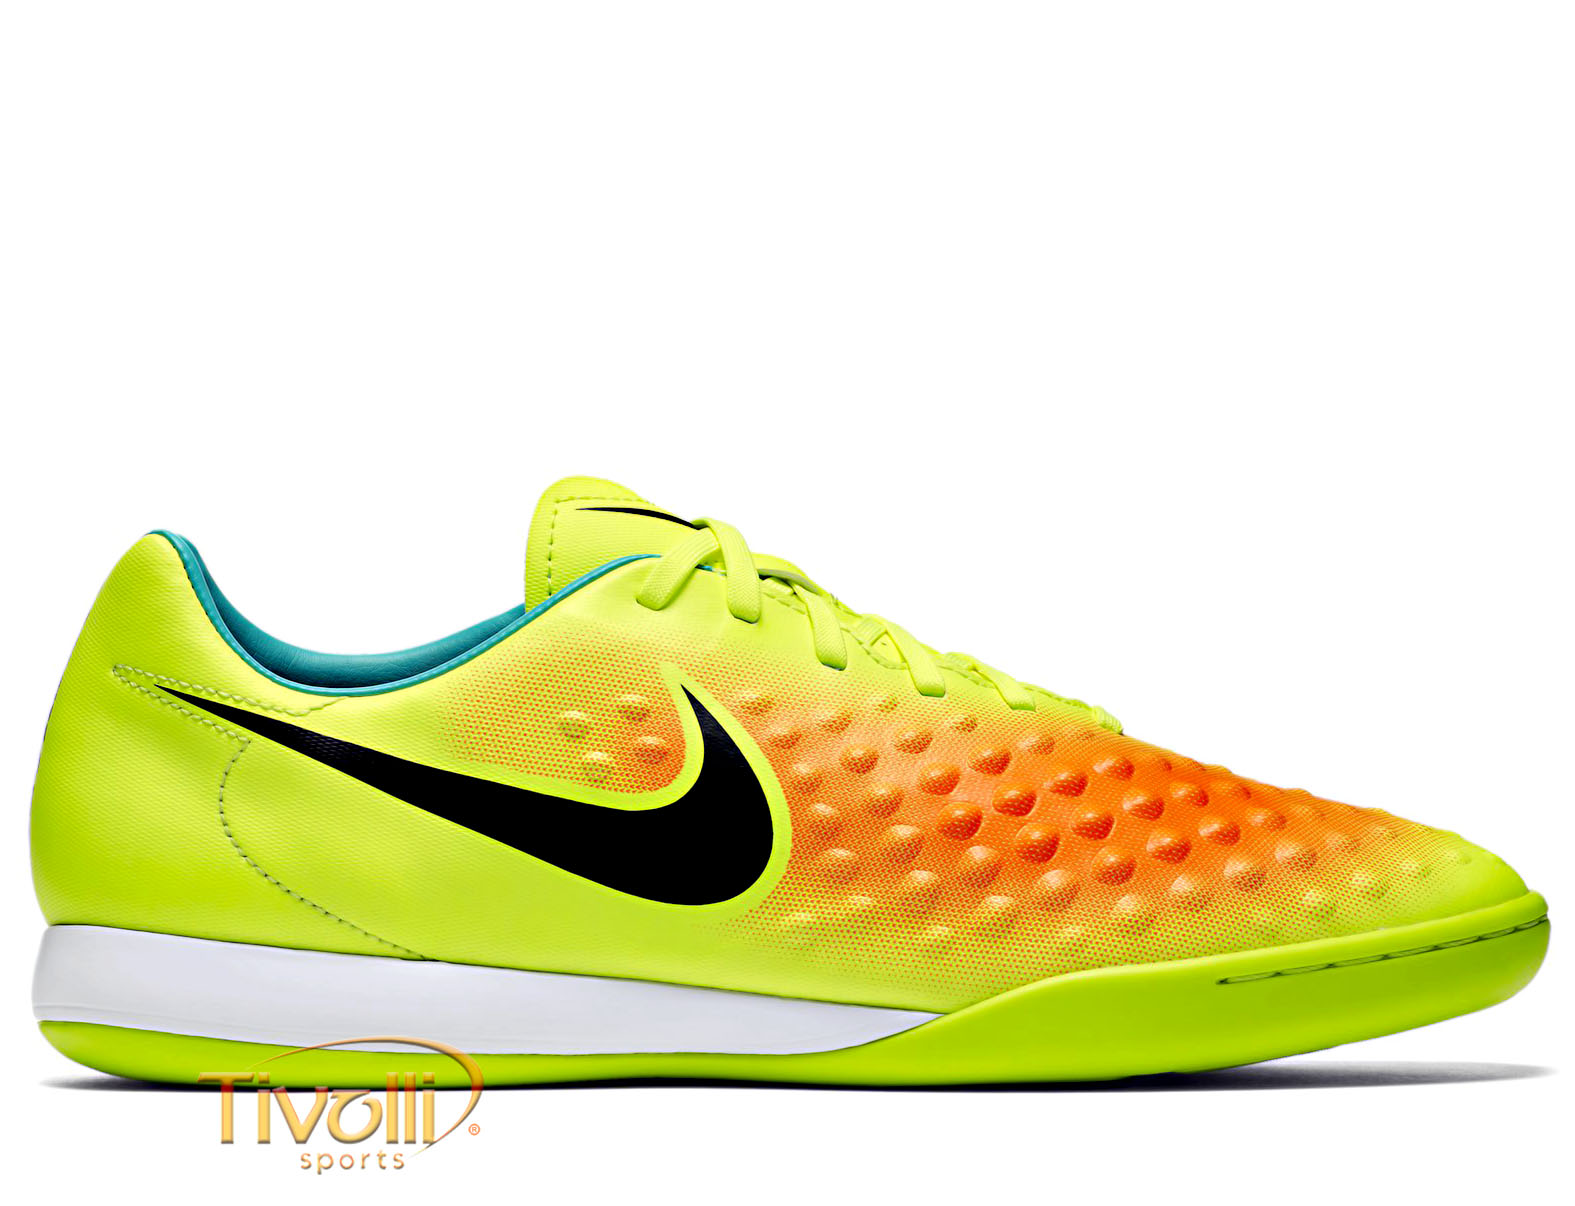 Atento Cooperativa Erudito  Chuteira Nike Magista Onda II ULTD IC Futsal > >